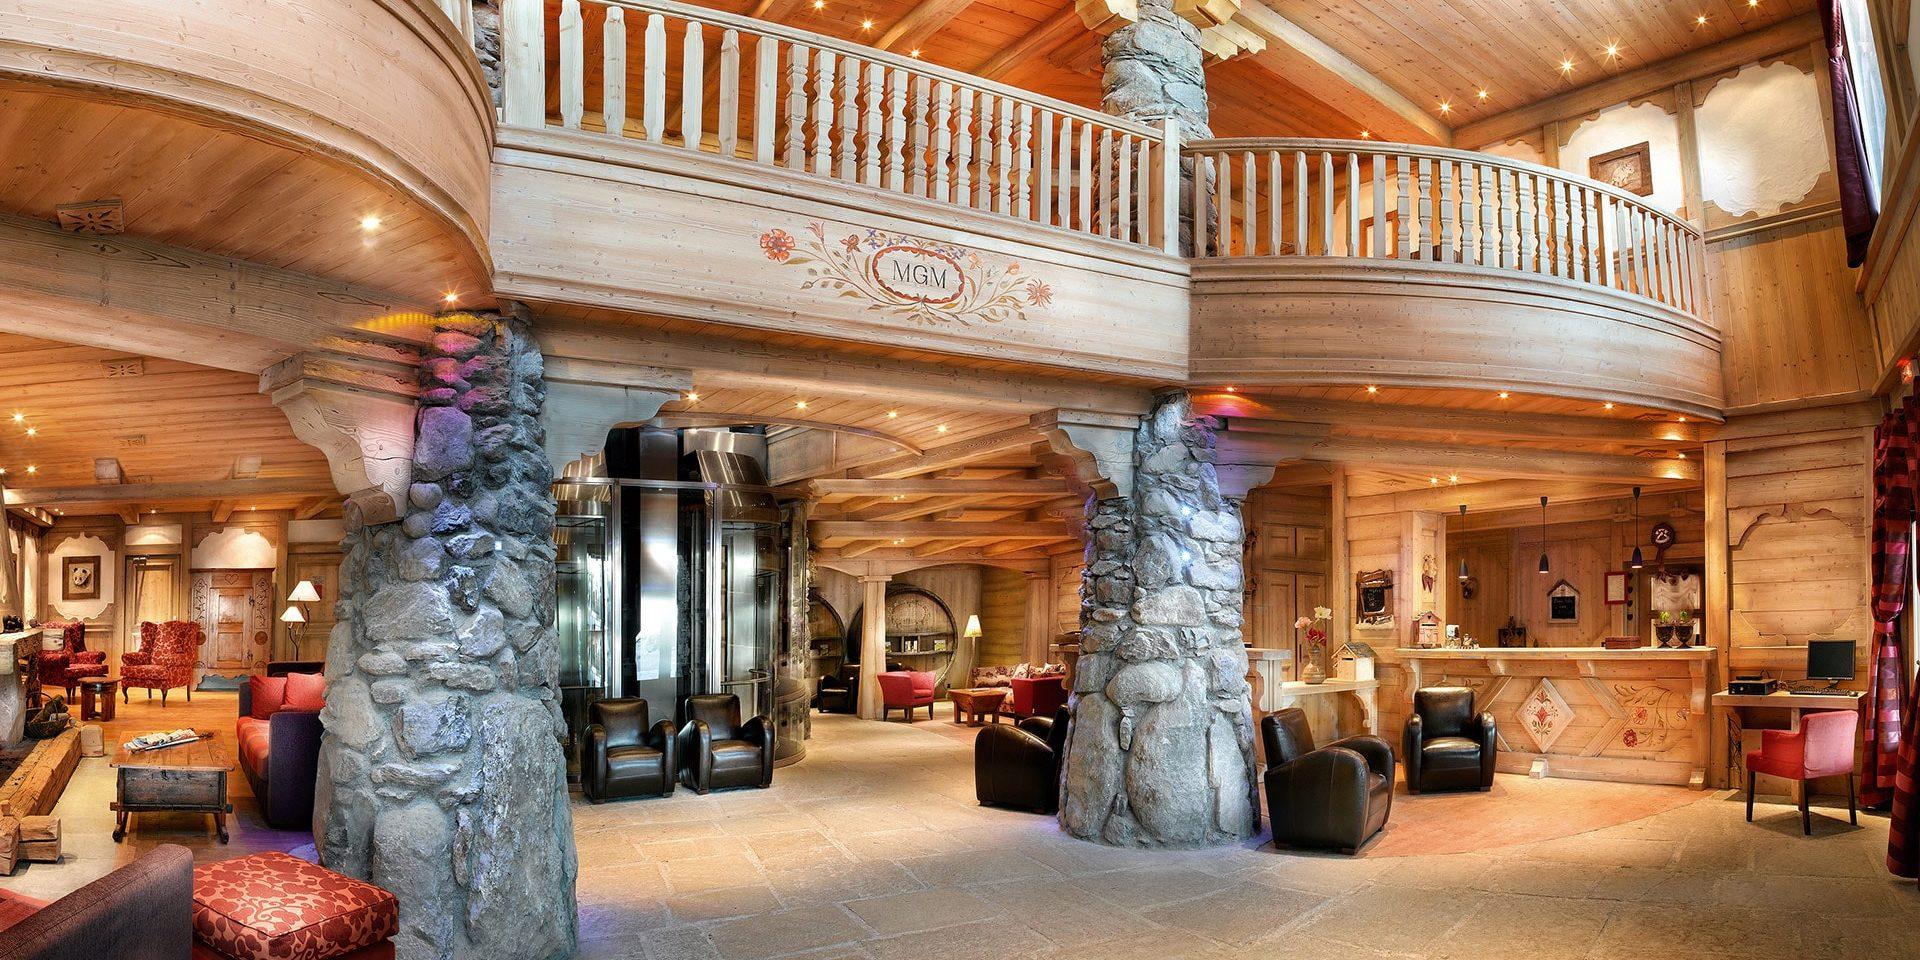 CGH Oree des Cimes Vallandry Paradiski Frankrijk wintersport skivakantie luxe receptie stenen pilaren hout balkon wachten ruim